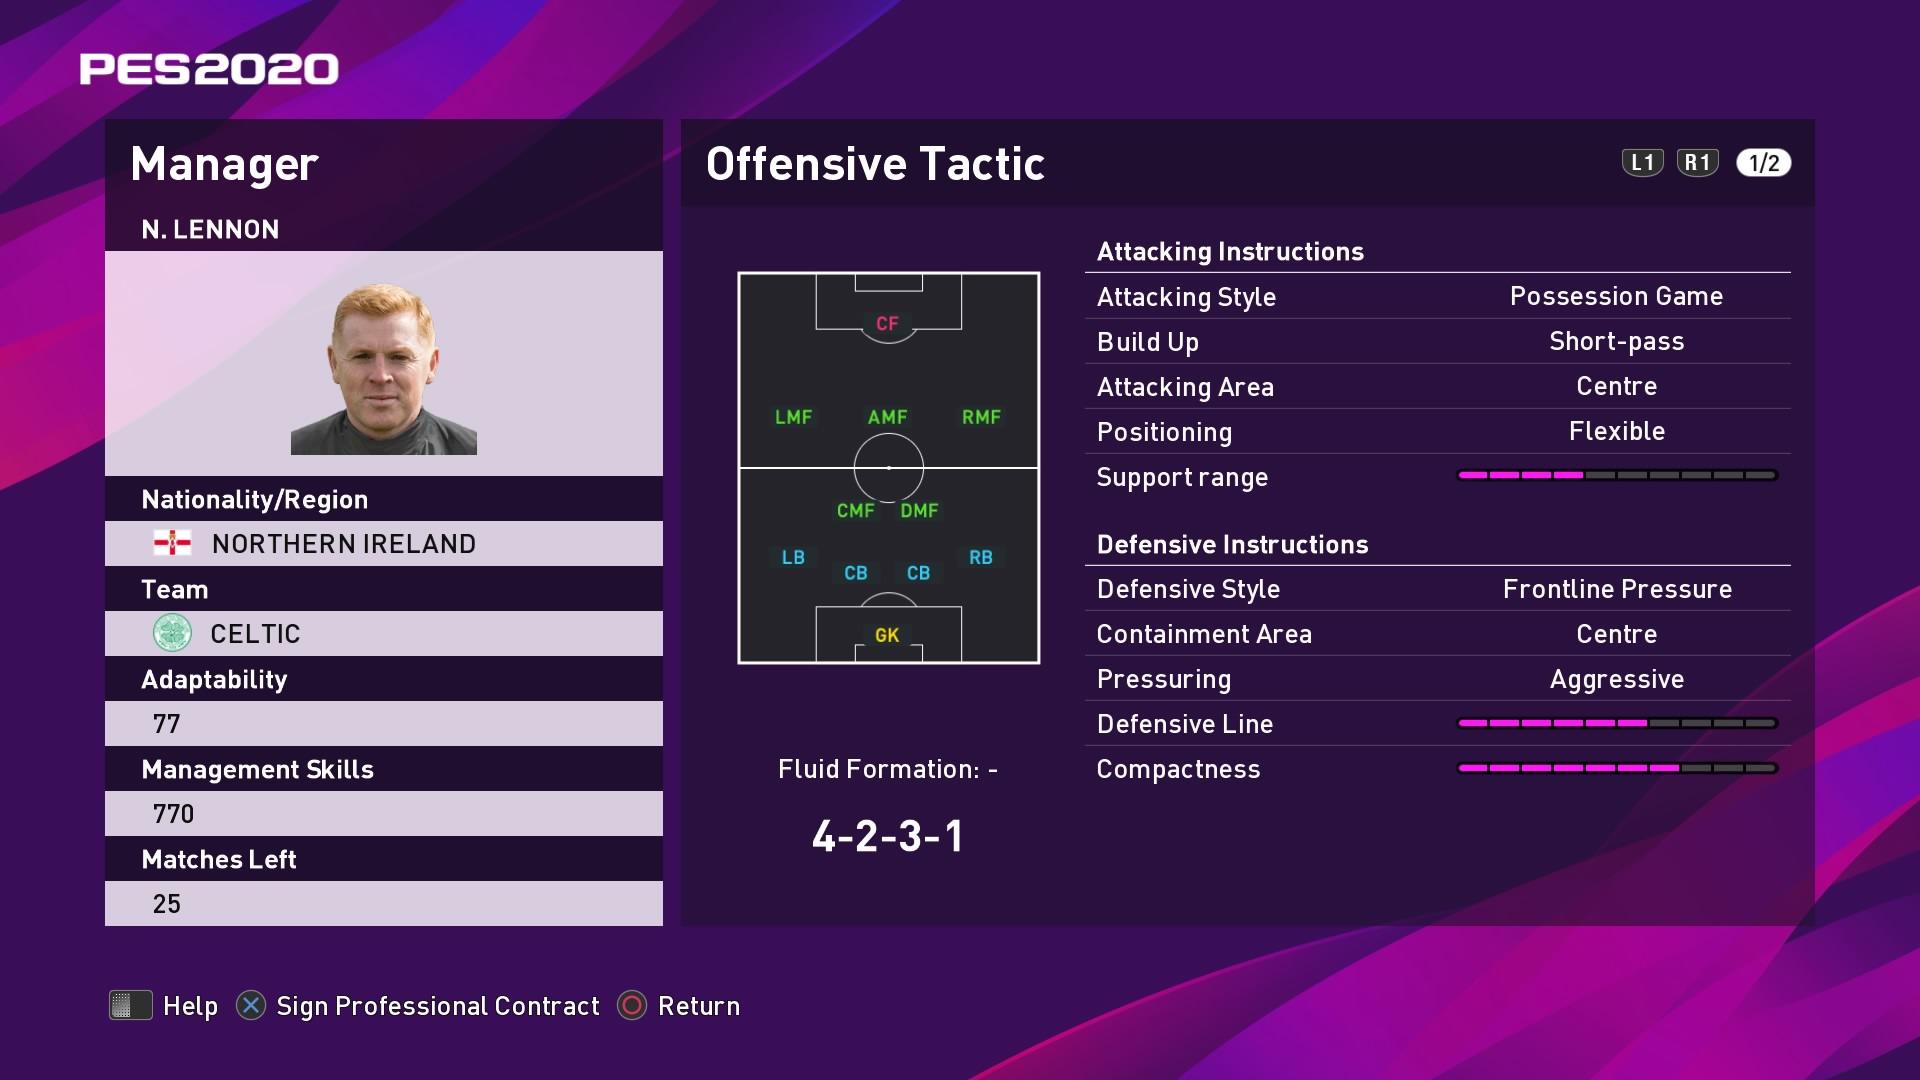 N. Lennon (Neil Lennon) Offensive Tactic in PES 2020 myClub